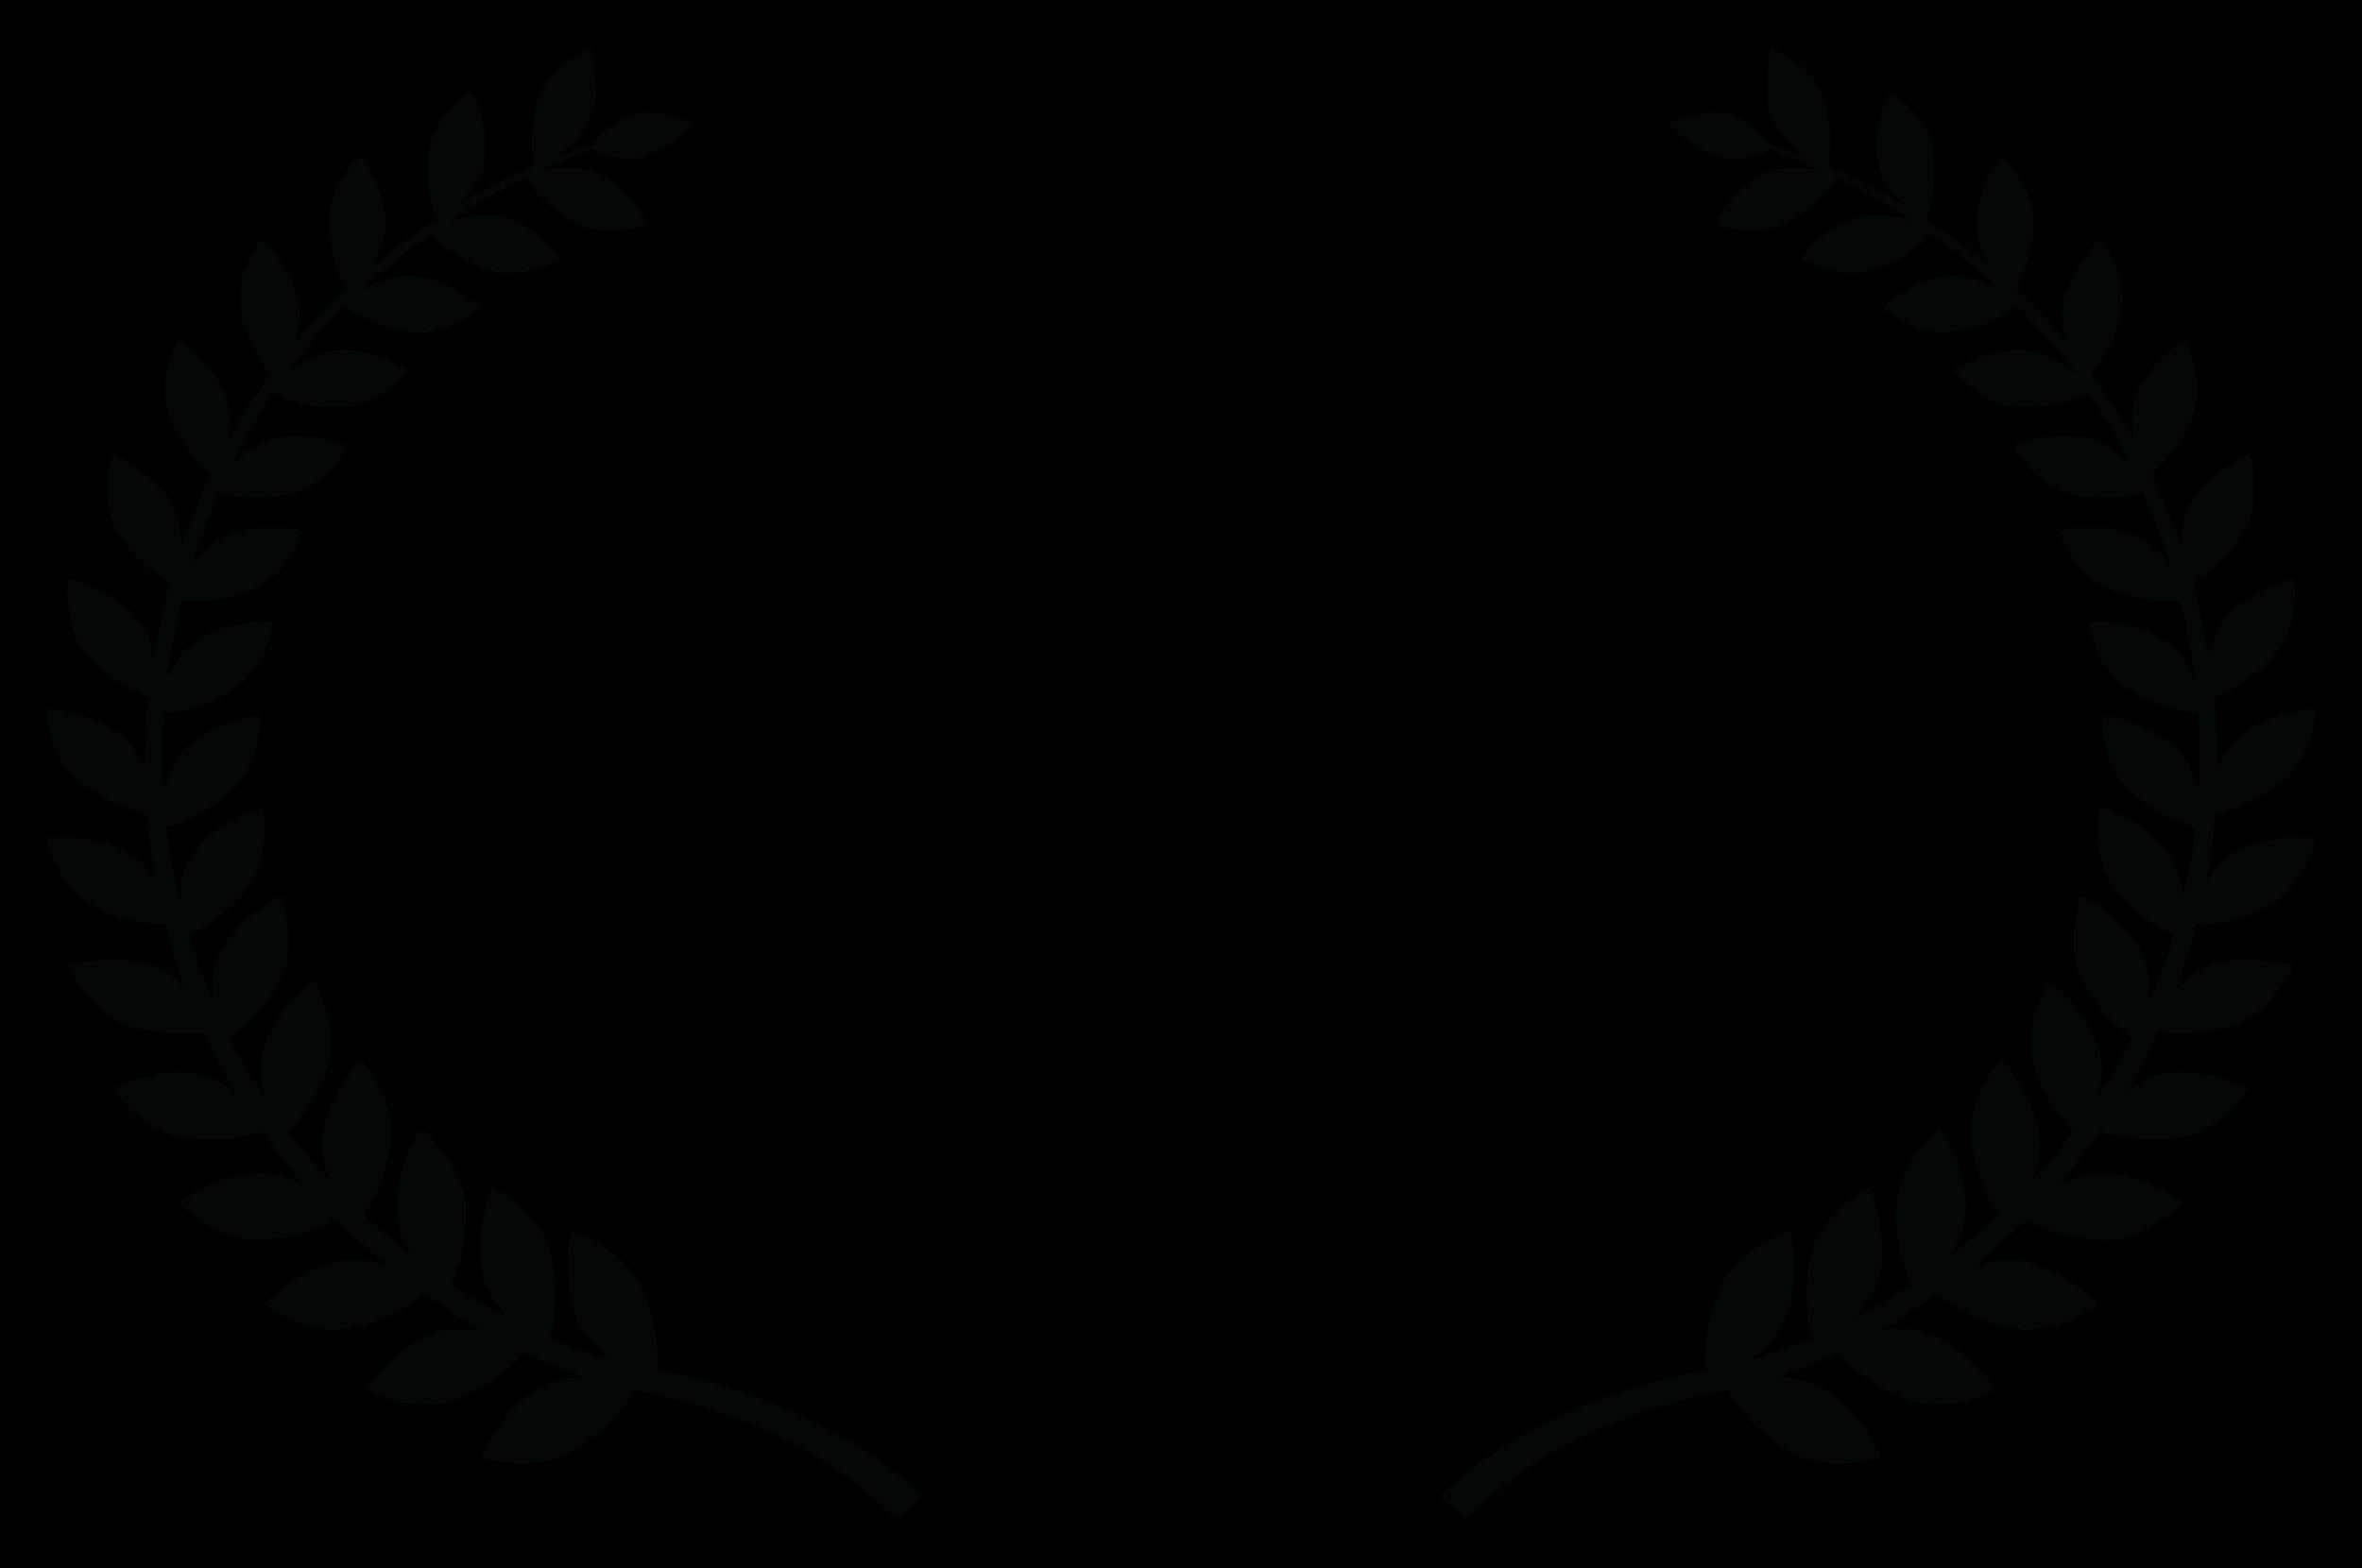 OFFICIALSELECTION-RICHMONDINTERNATIONALFILMFESTIVAL-2019.png